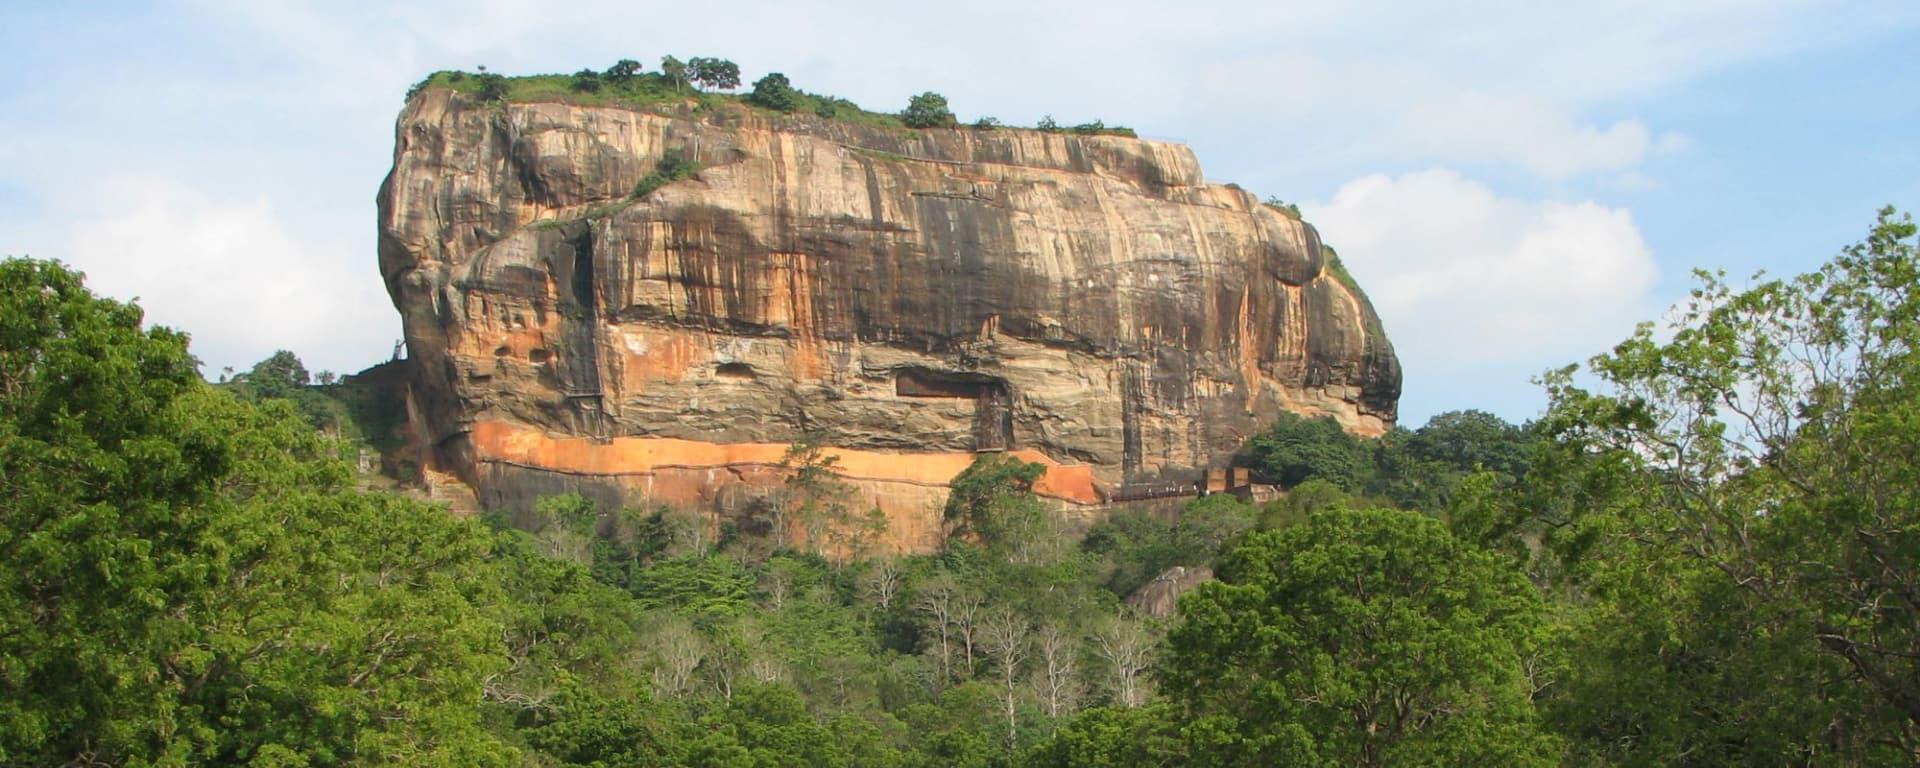 Sri Lanka Kompakt ab Colombo: Sigiriya: Lions Rock